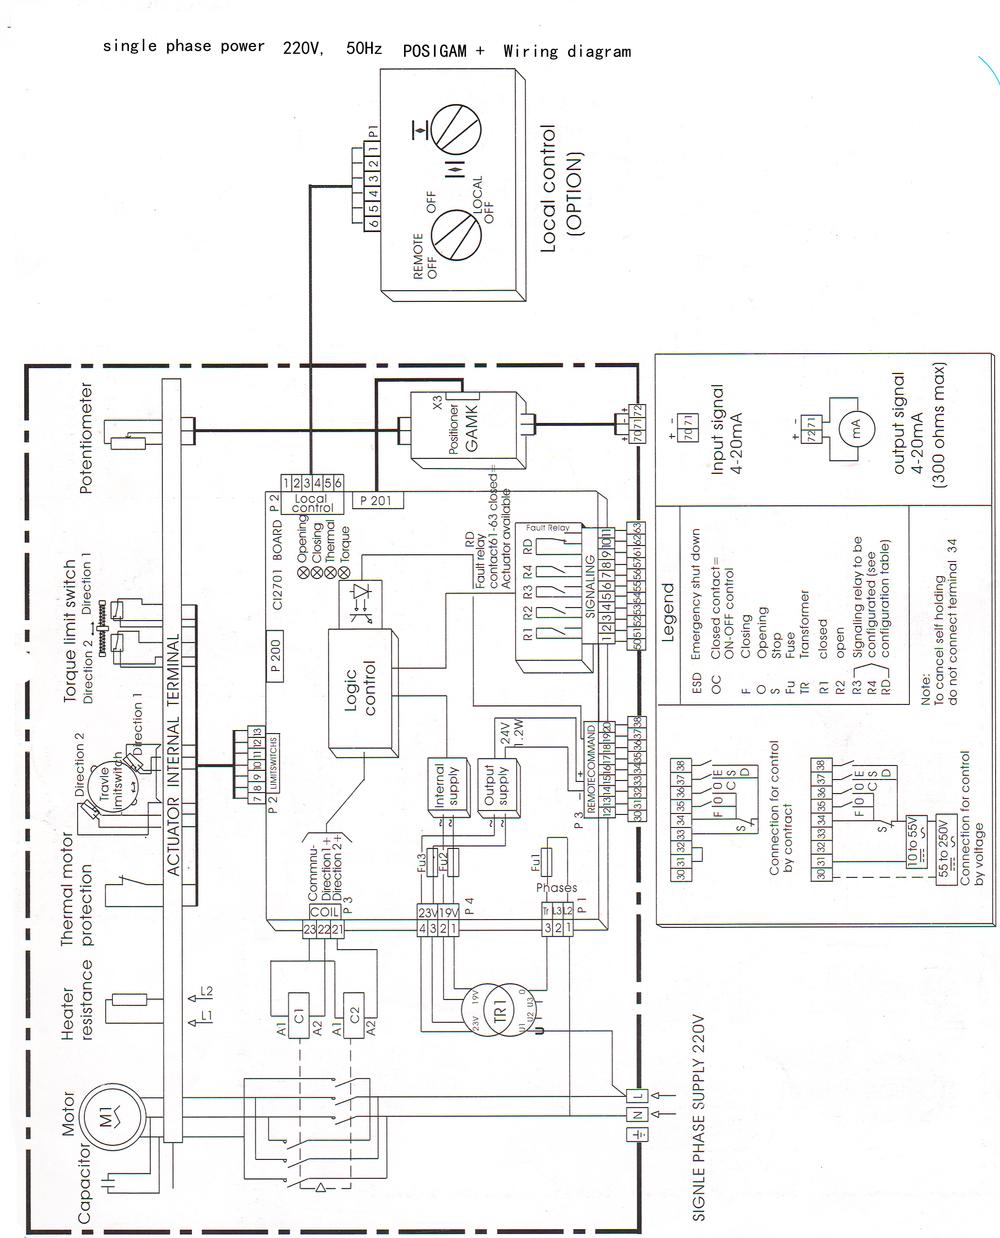 Bernard Actuator Wiring Diagram Free Download • Oasis-dl.co